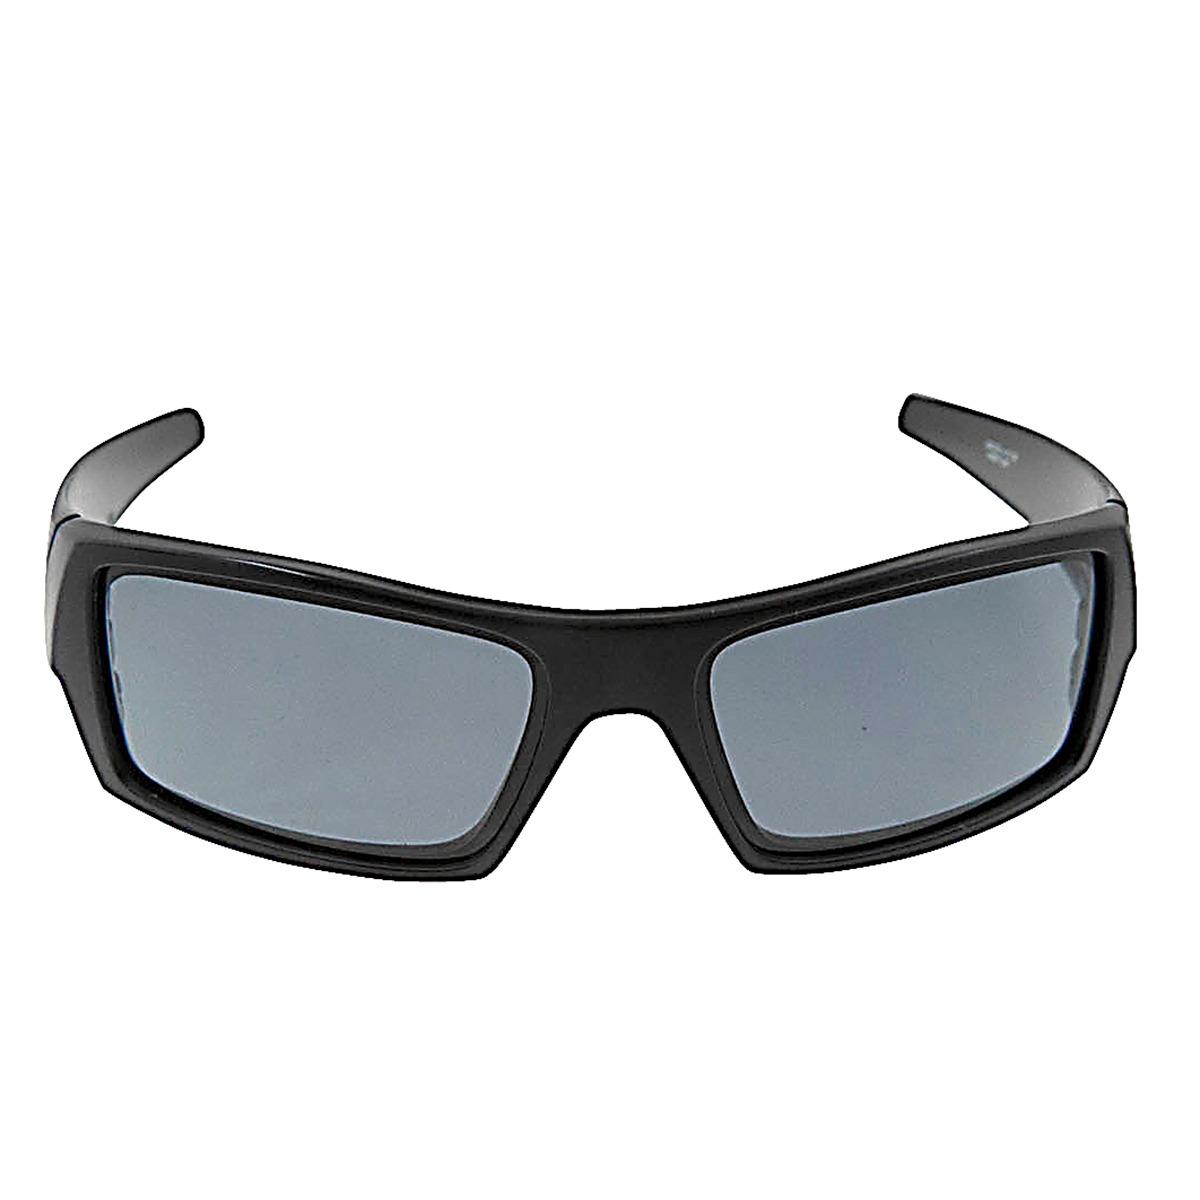 174d2cc36ab Details about New Authentic Oakley Gascan Sunglasses Matte Black with Grey  Lenses